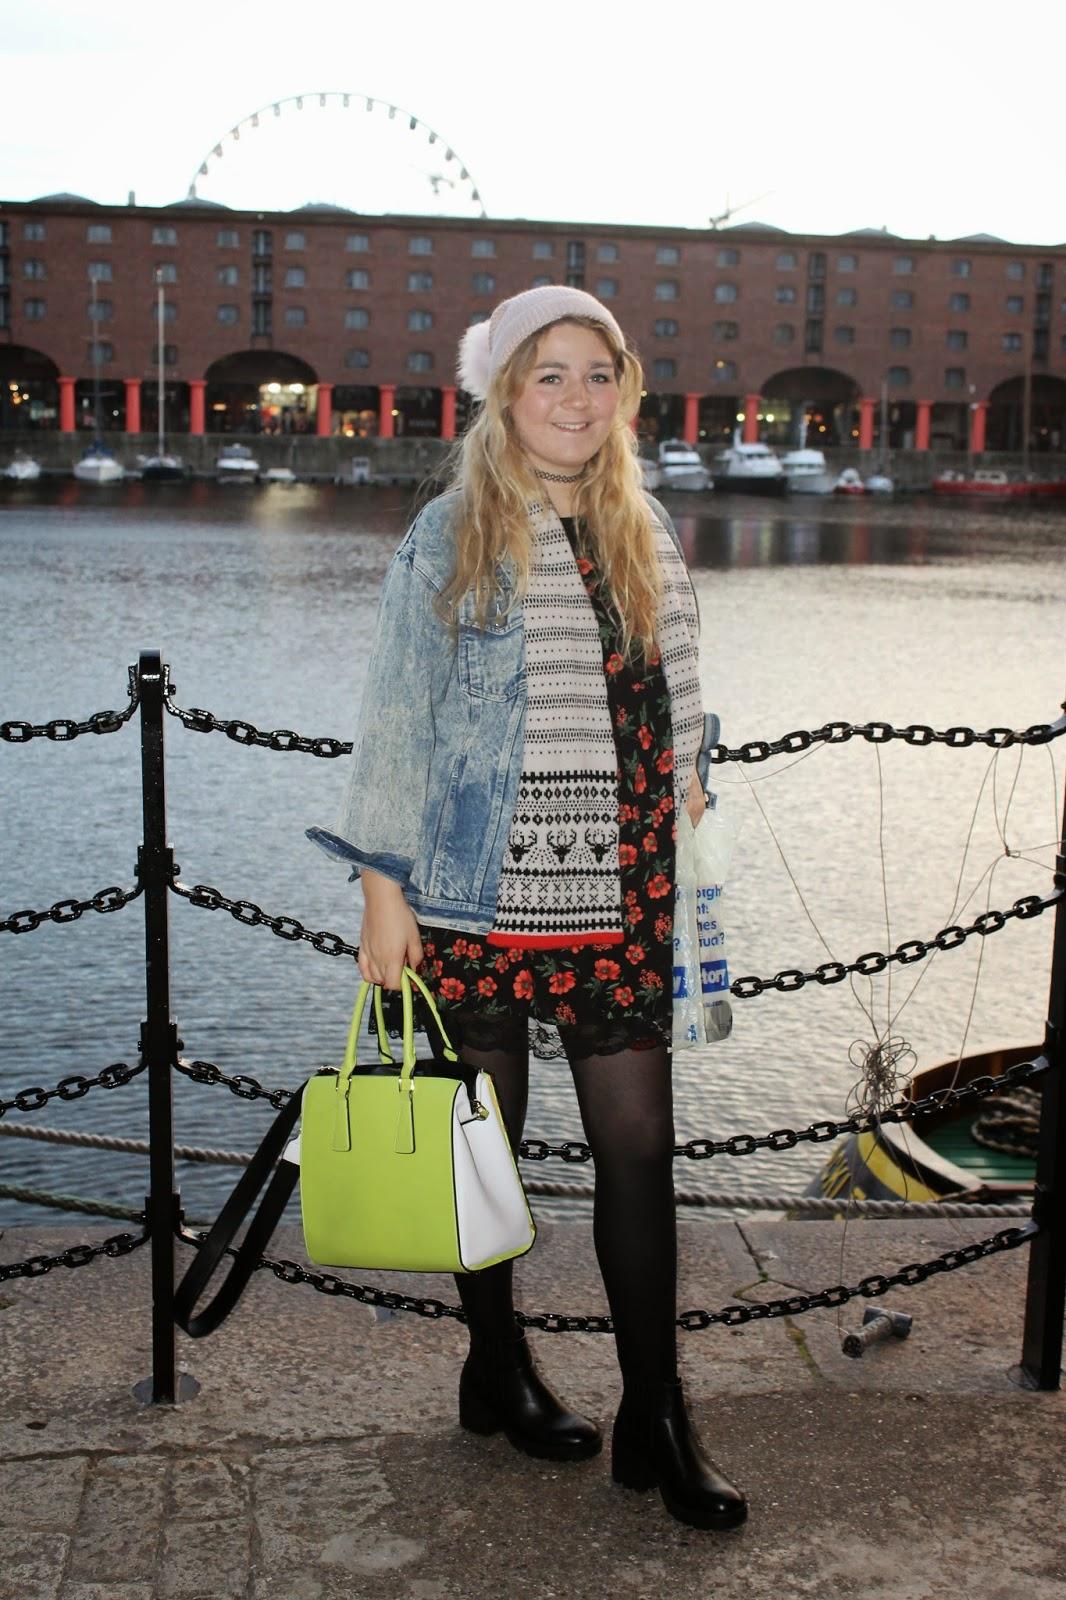 New Look Floral Dress Liverpool Docks